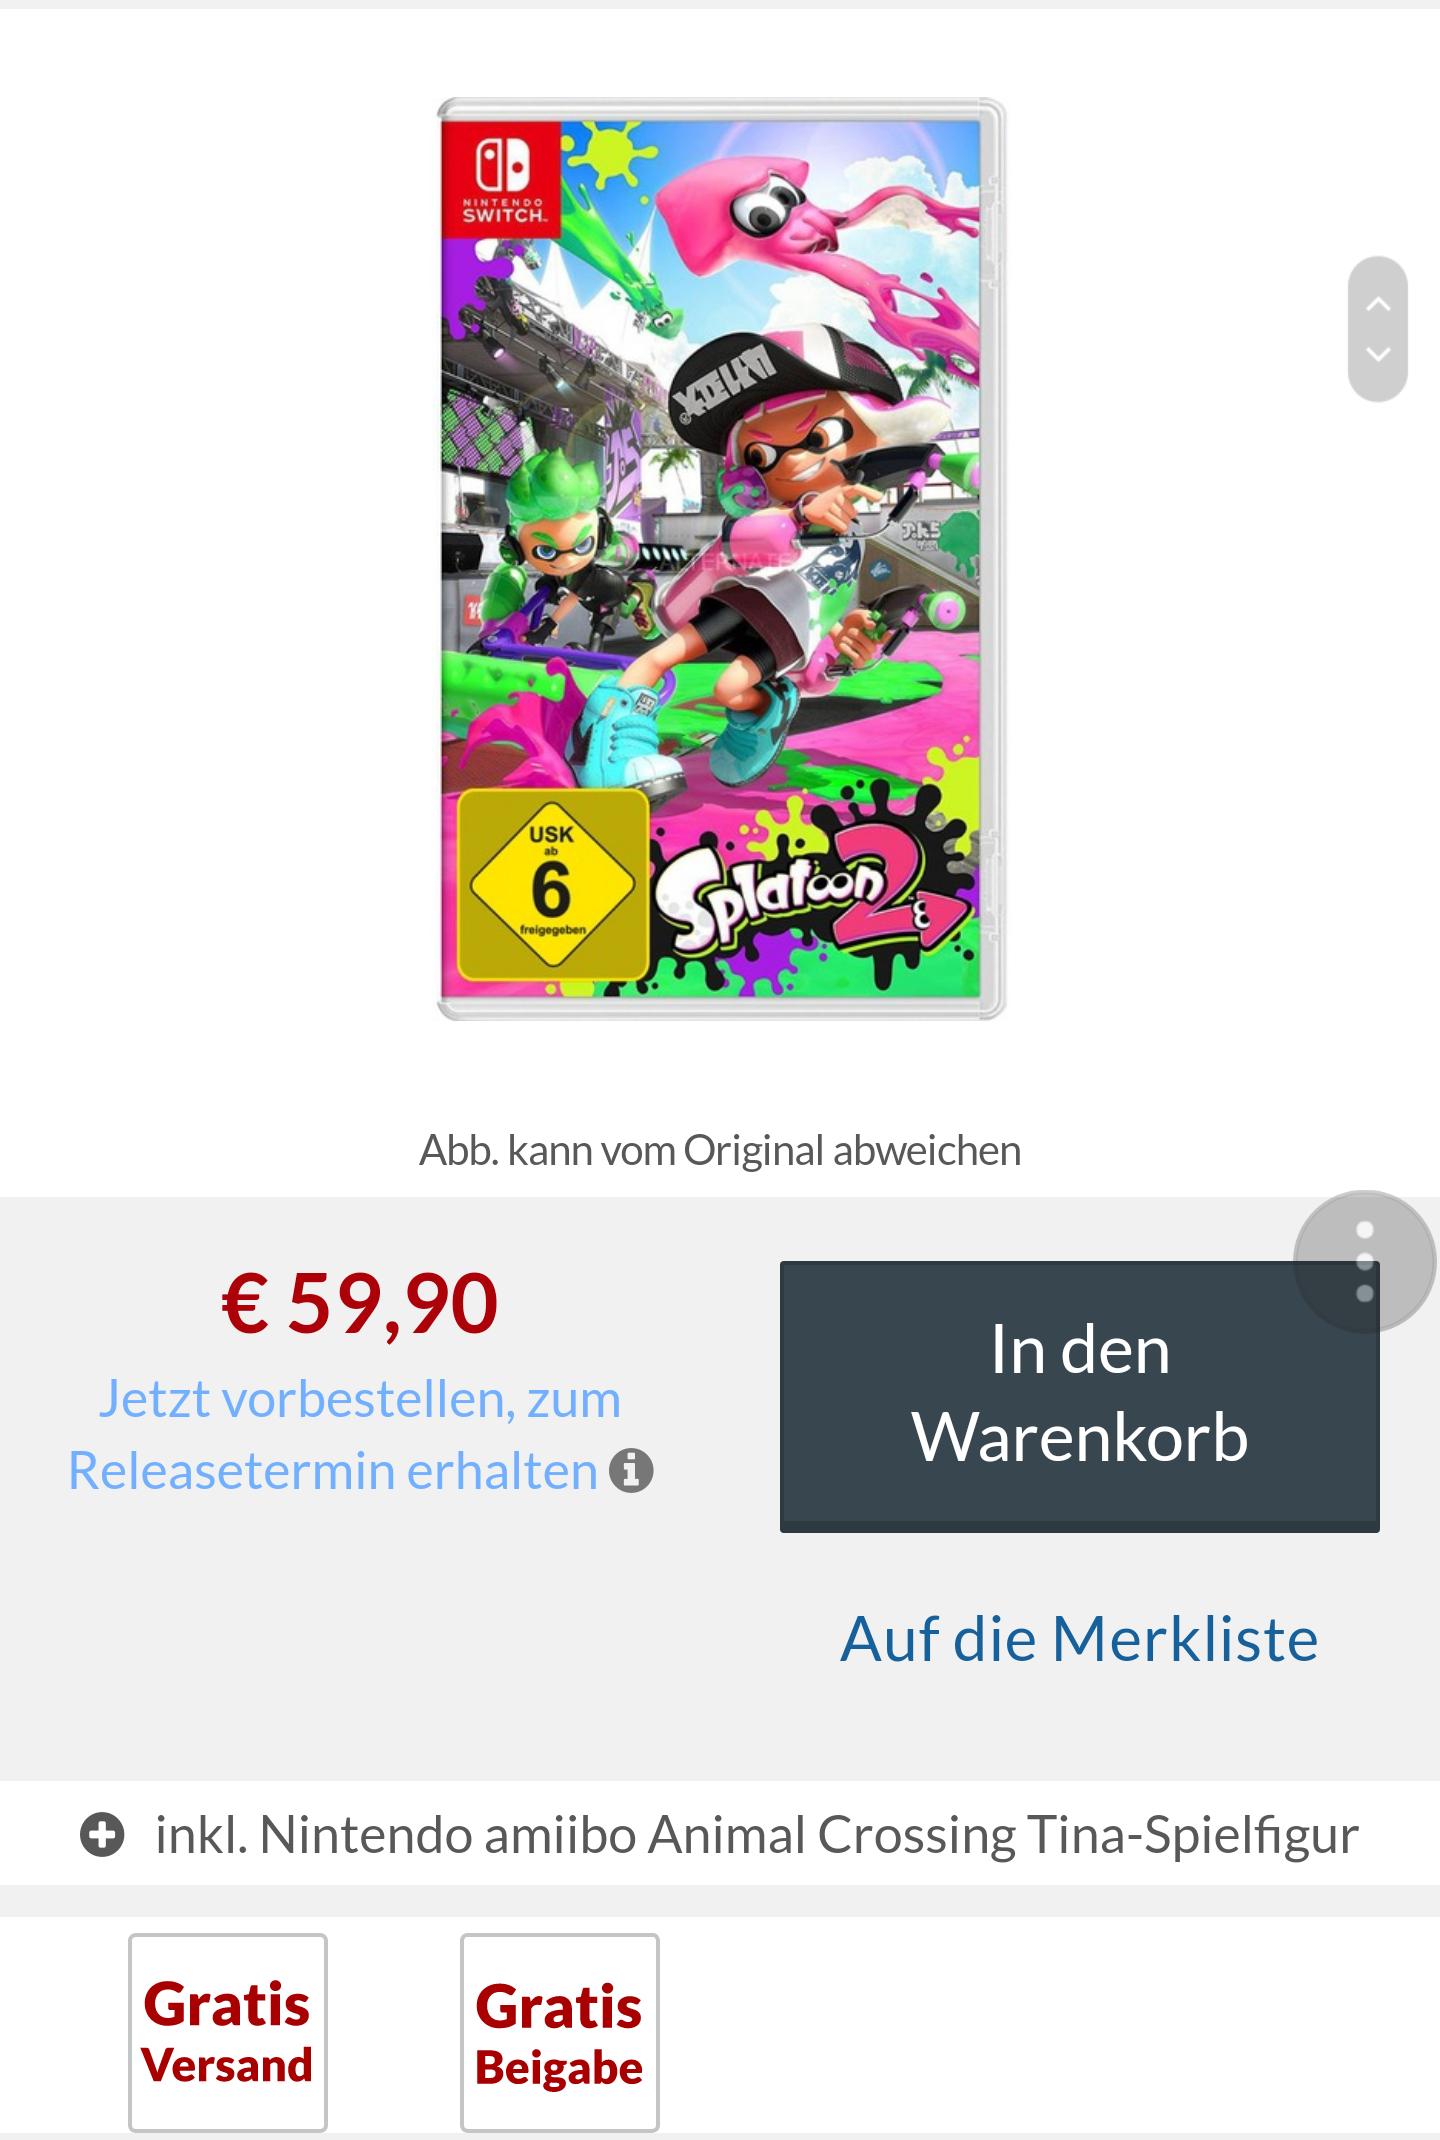 Splatoon 2 + Amiibo Animal Crossing Tina